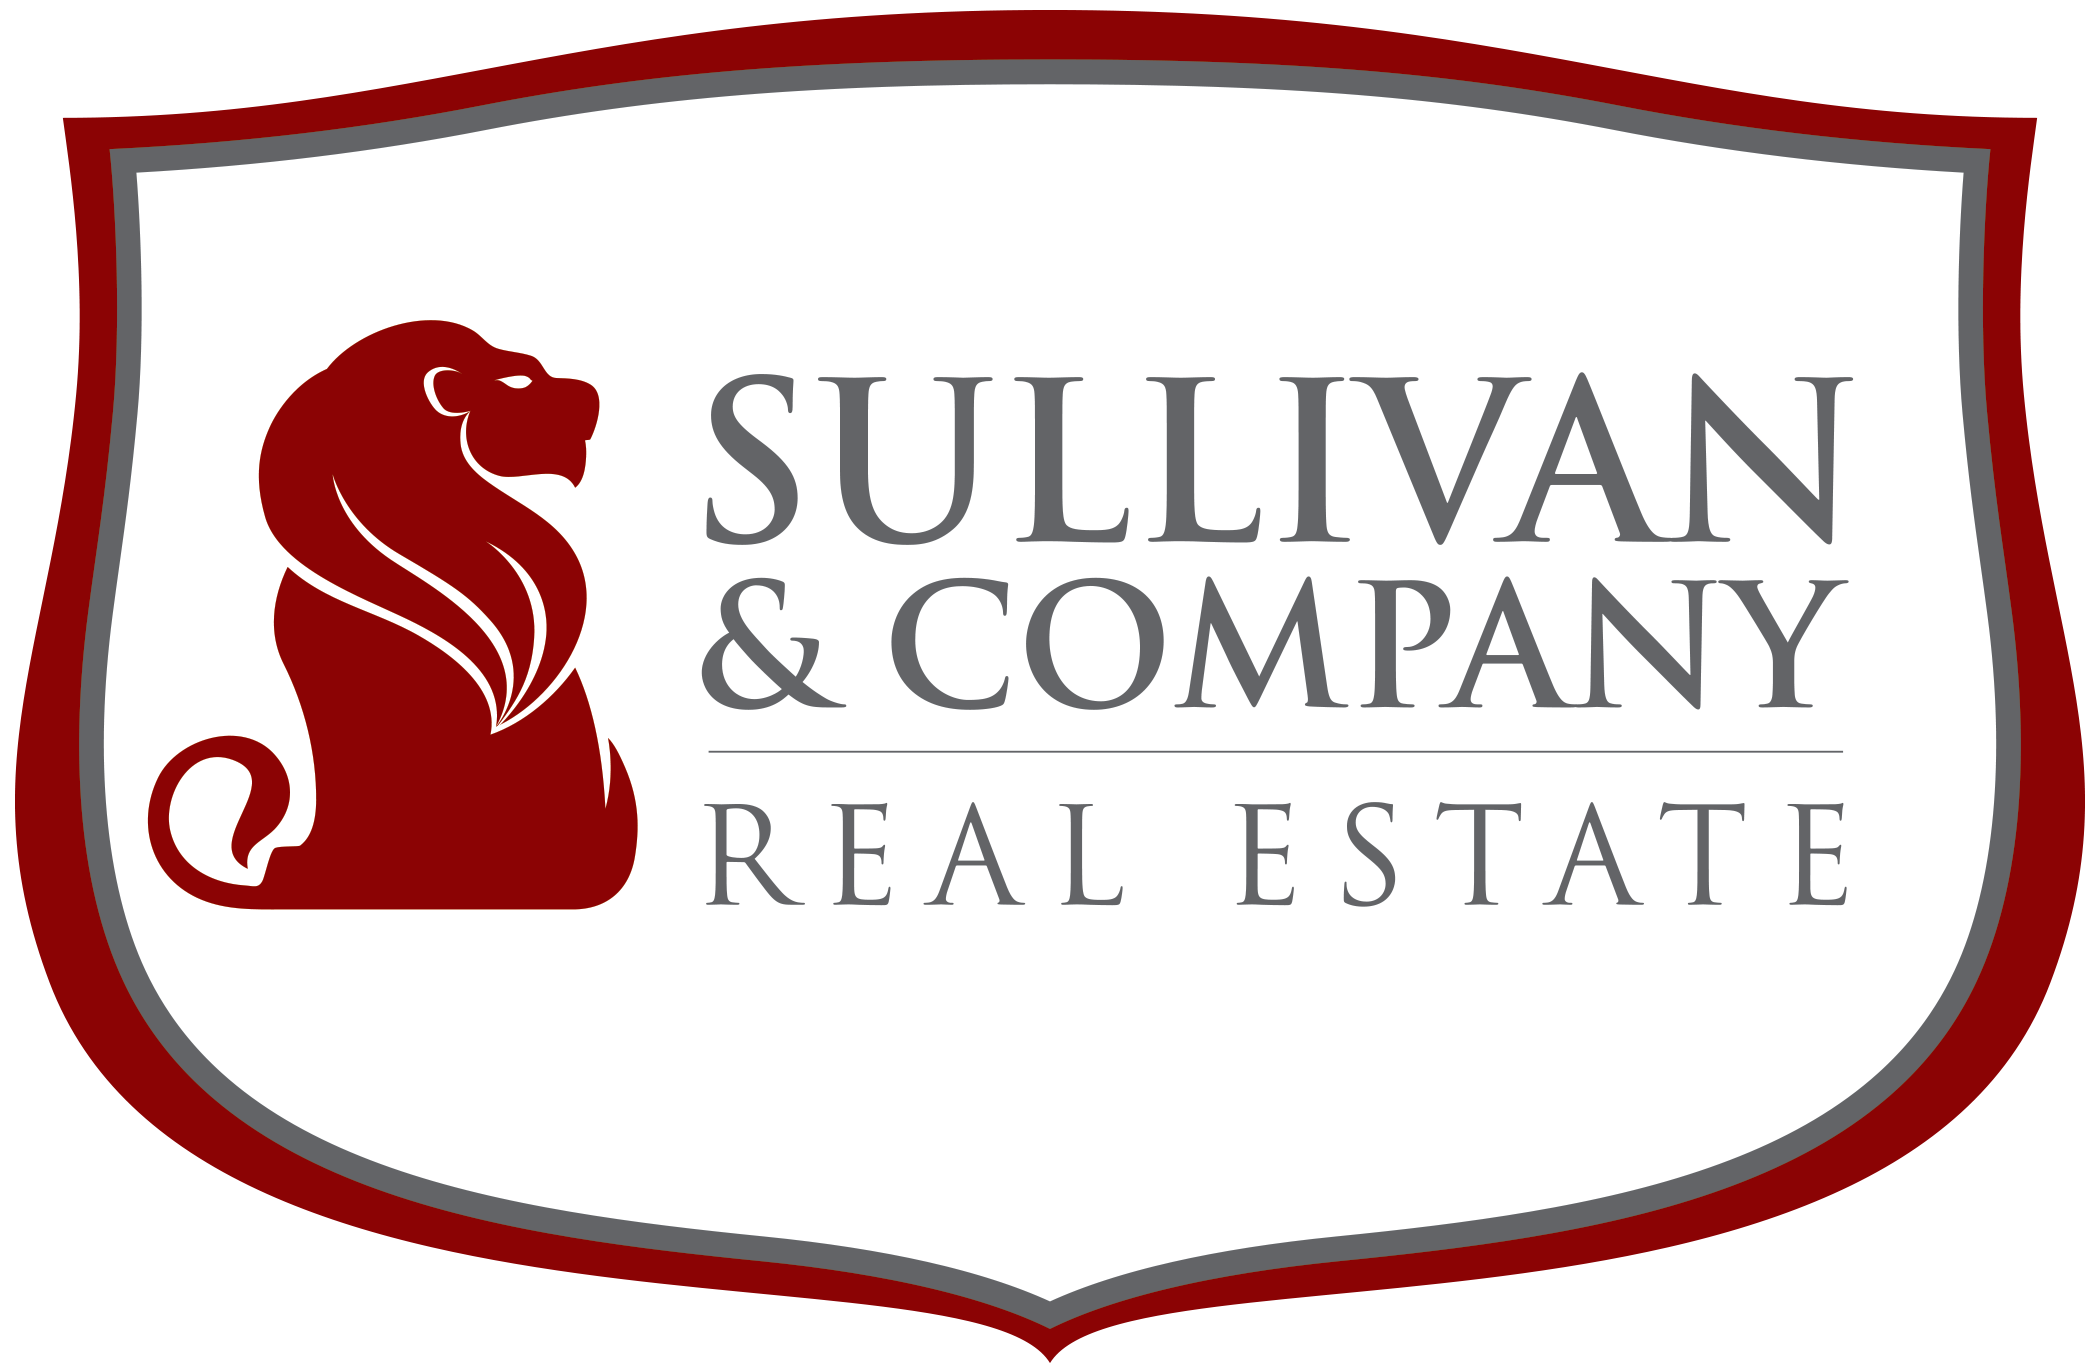 Sponsor Sullivan & Company Real Estate, INC